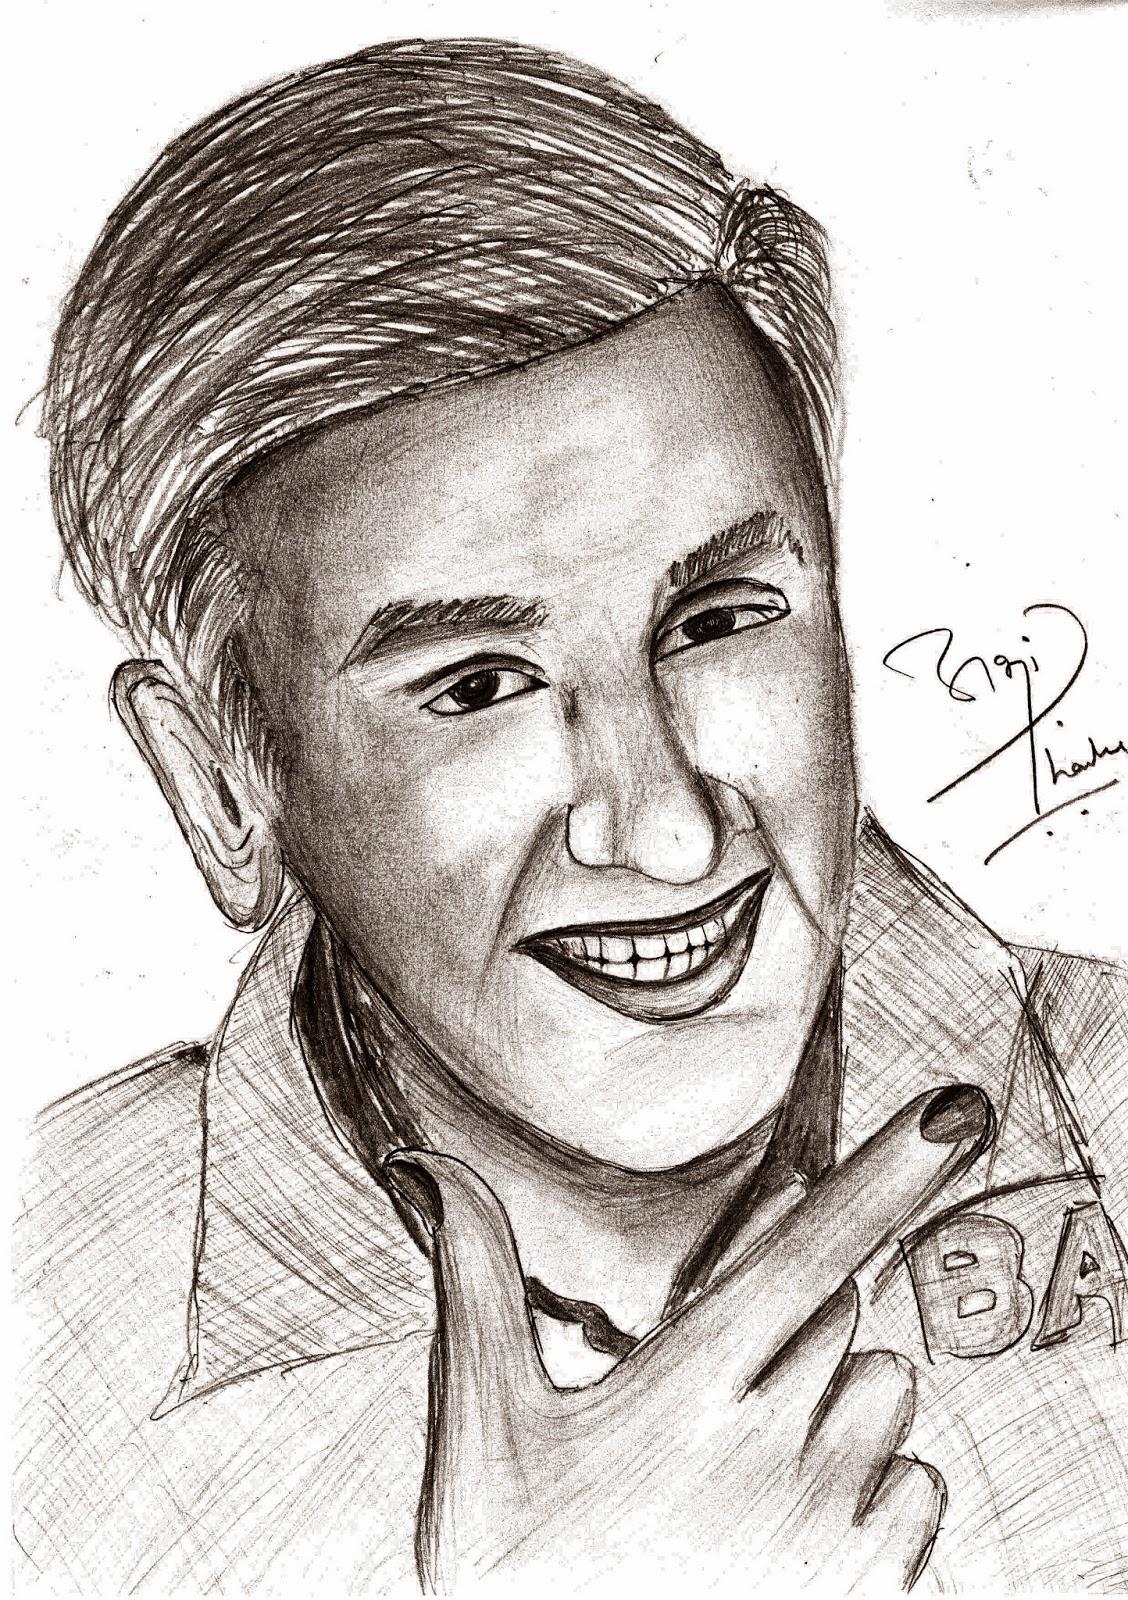 Ranbir Kapoor Sketch by Abhshek Thamke